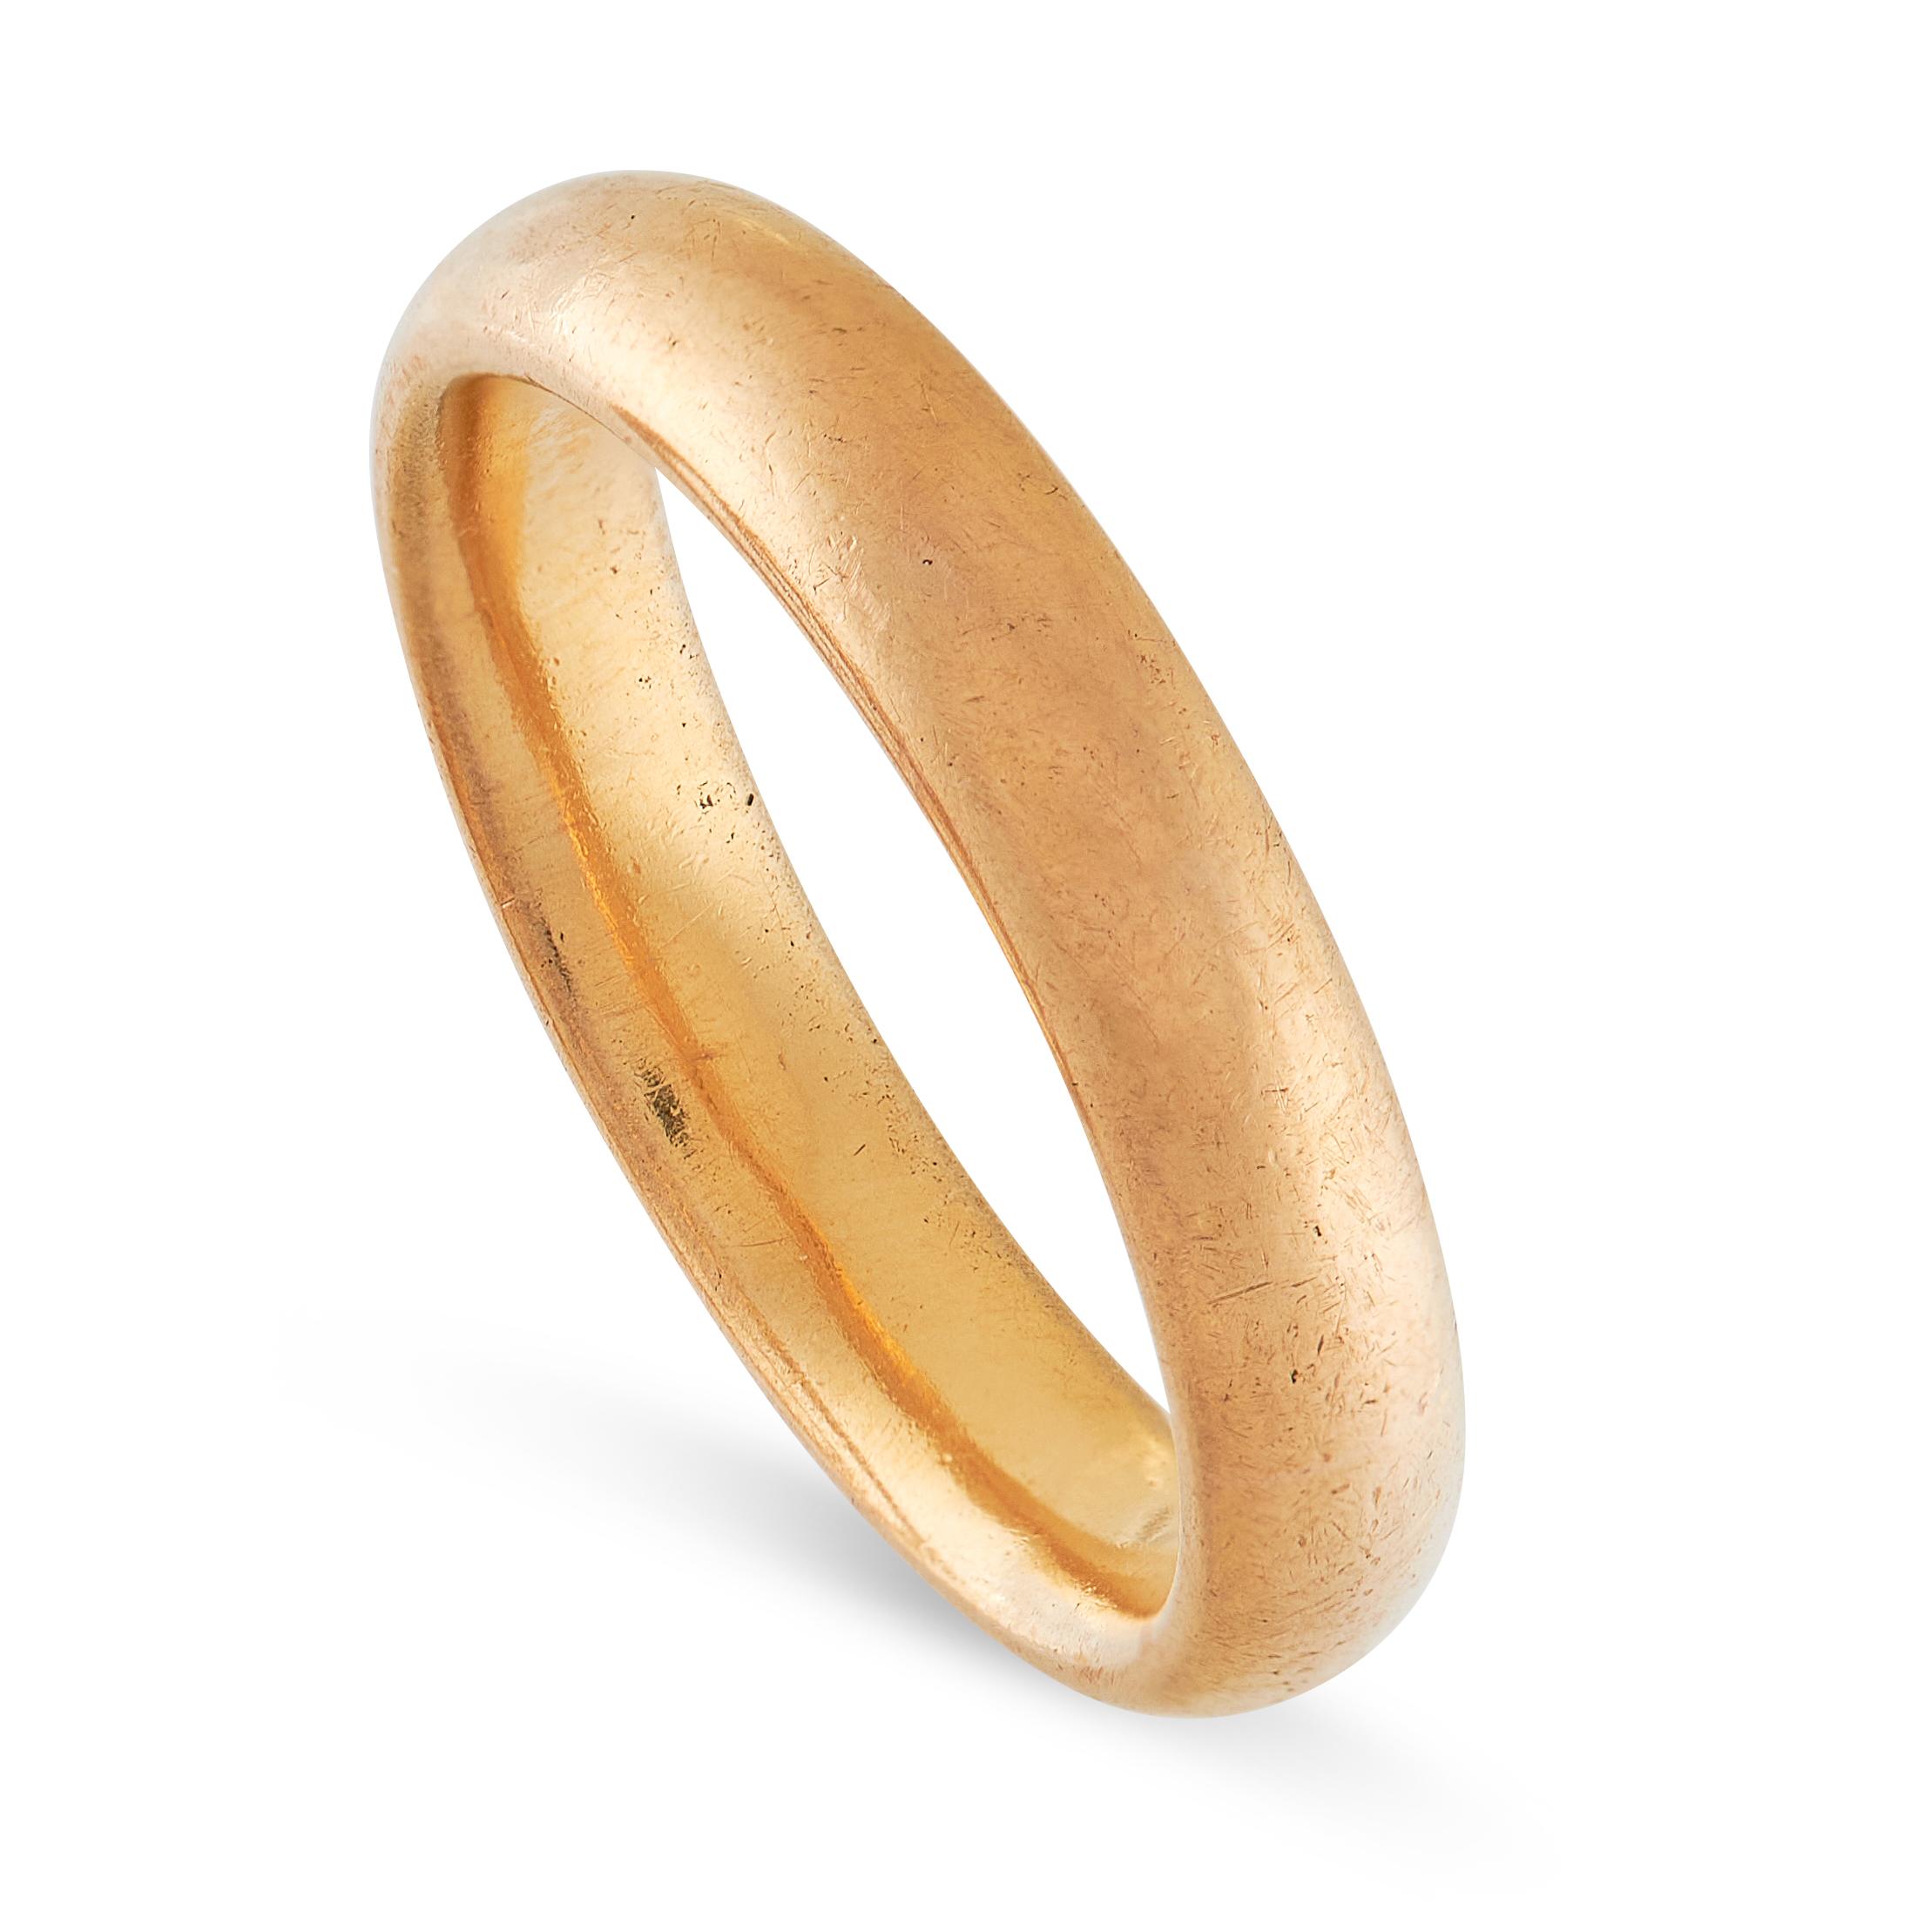 THREE WEDDING BAND RINGS in 22ct yellow gold, British hallmarks, sizes M / 6, R / 8.5, O / 7, - Image 6 of 6